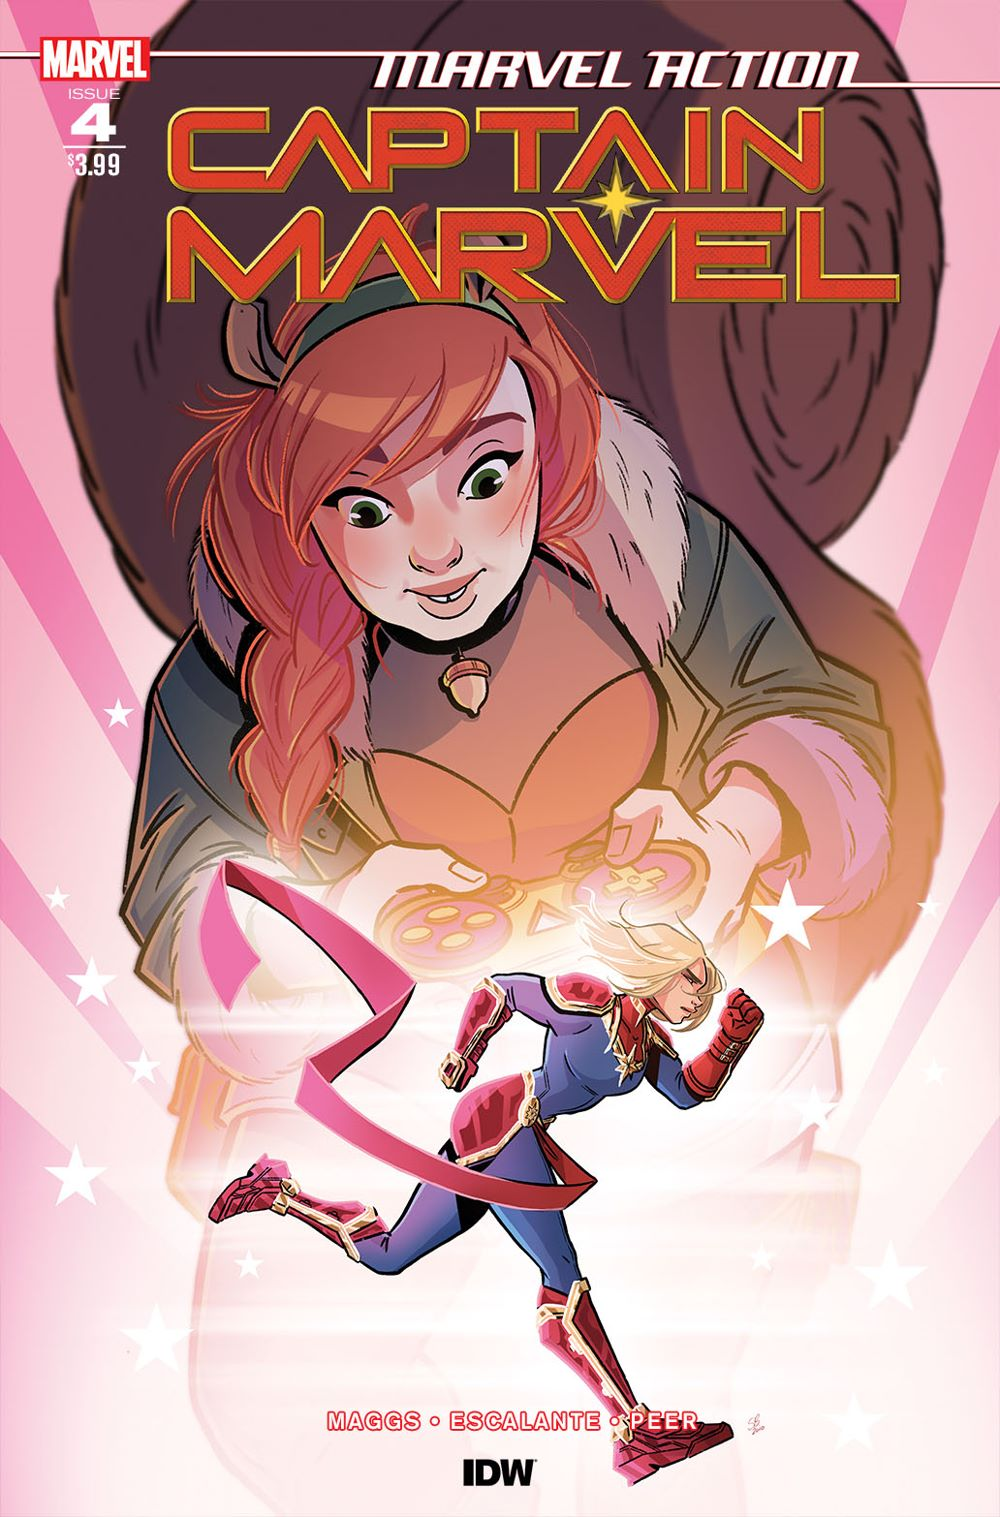 CaptainMarvel_Acvr_04-copy IDW Publishing April 2021 Solicitations